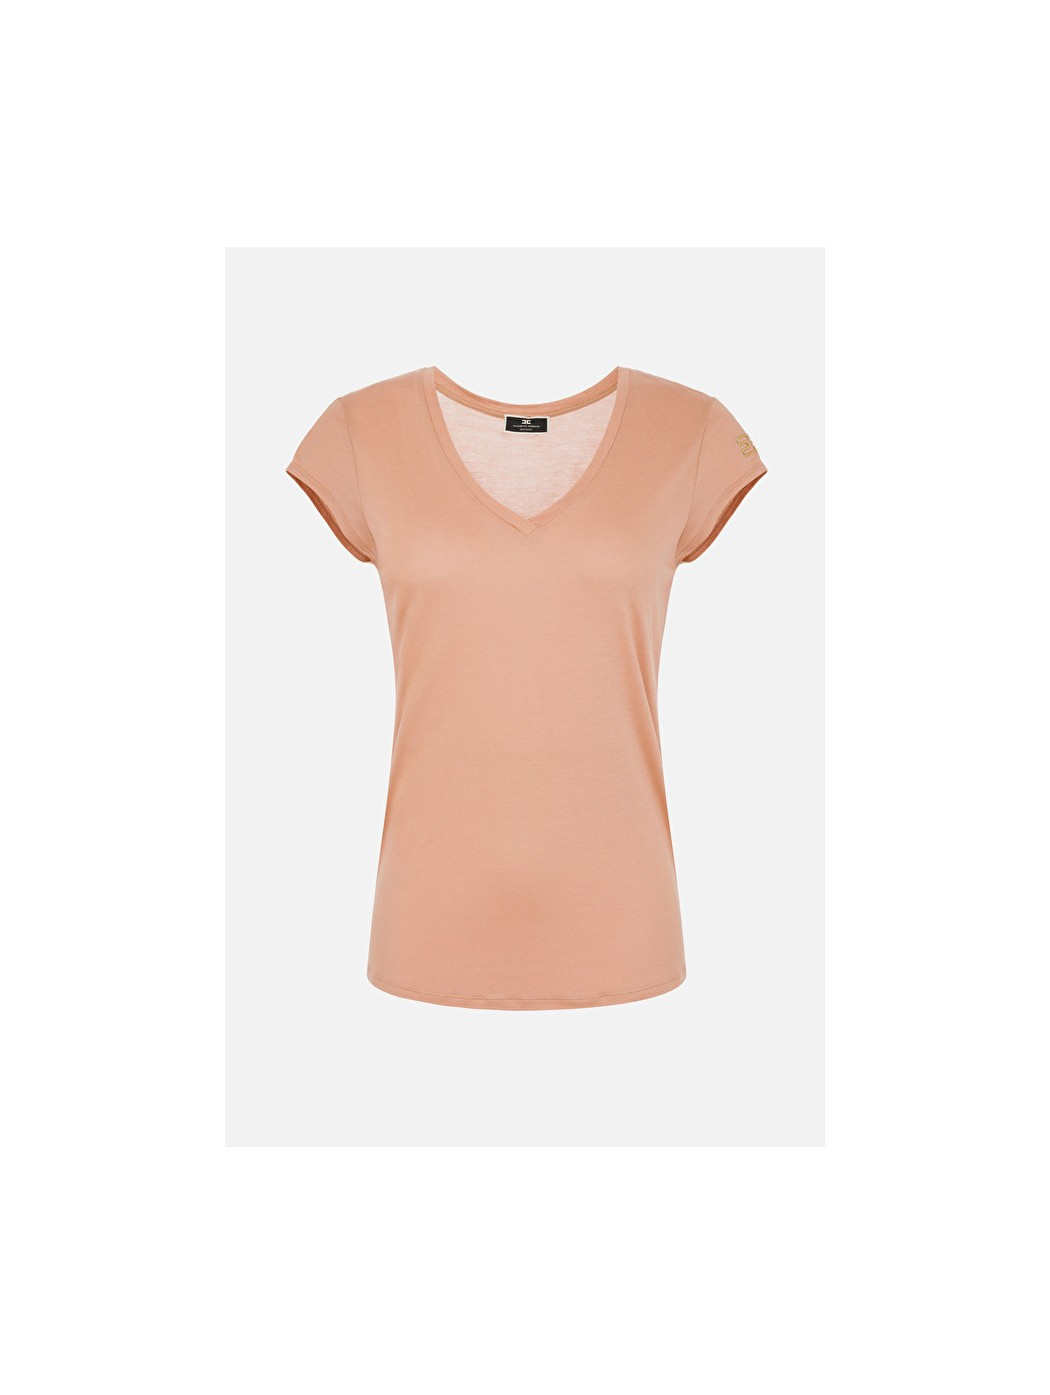 T-shirt Elisabetta Franchi manica corta ELISABETTA  FRANCHI MA00111E2 W71